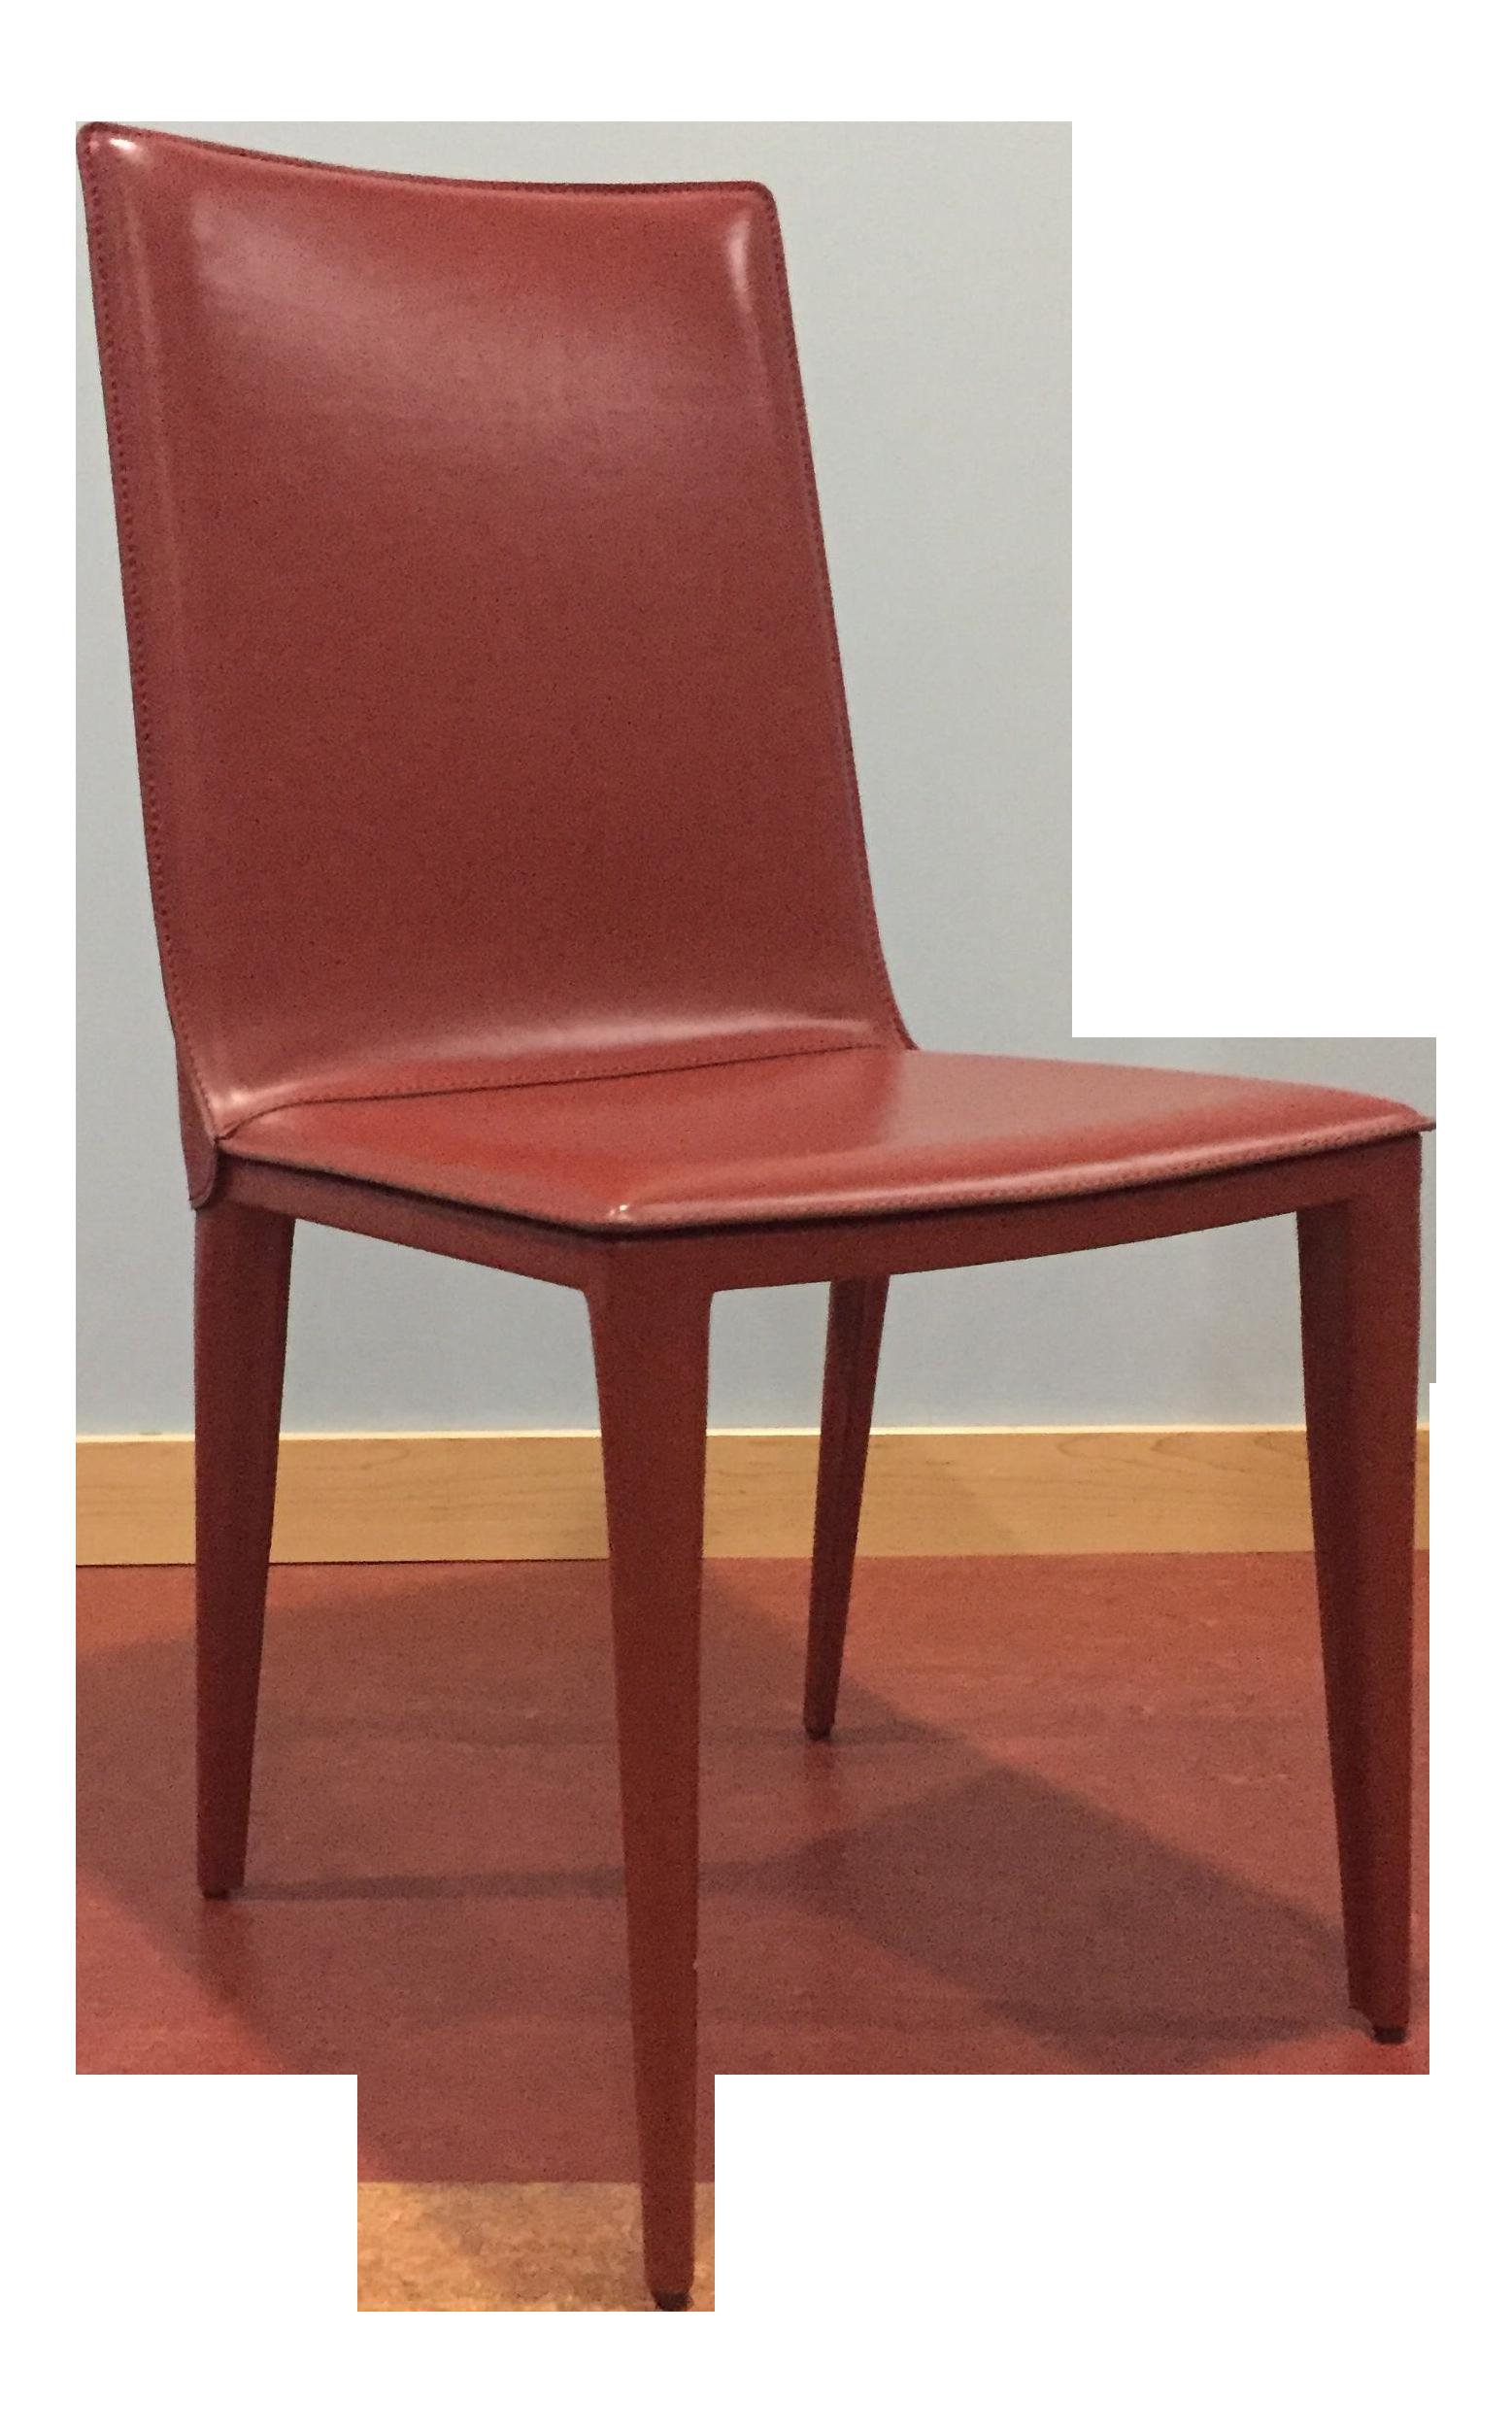 Marvelous DWR Red Bottega Side Chair